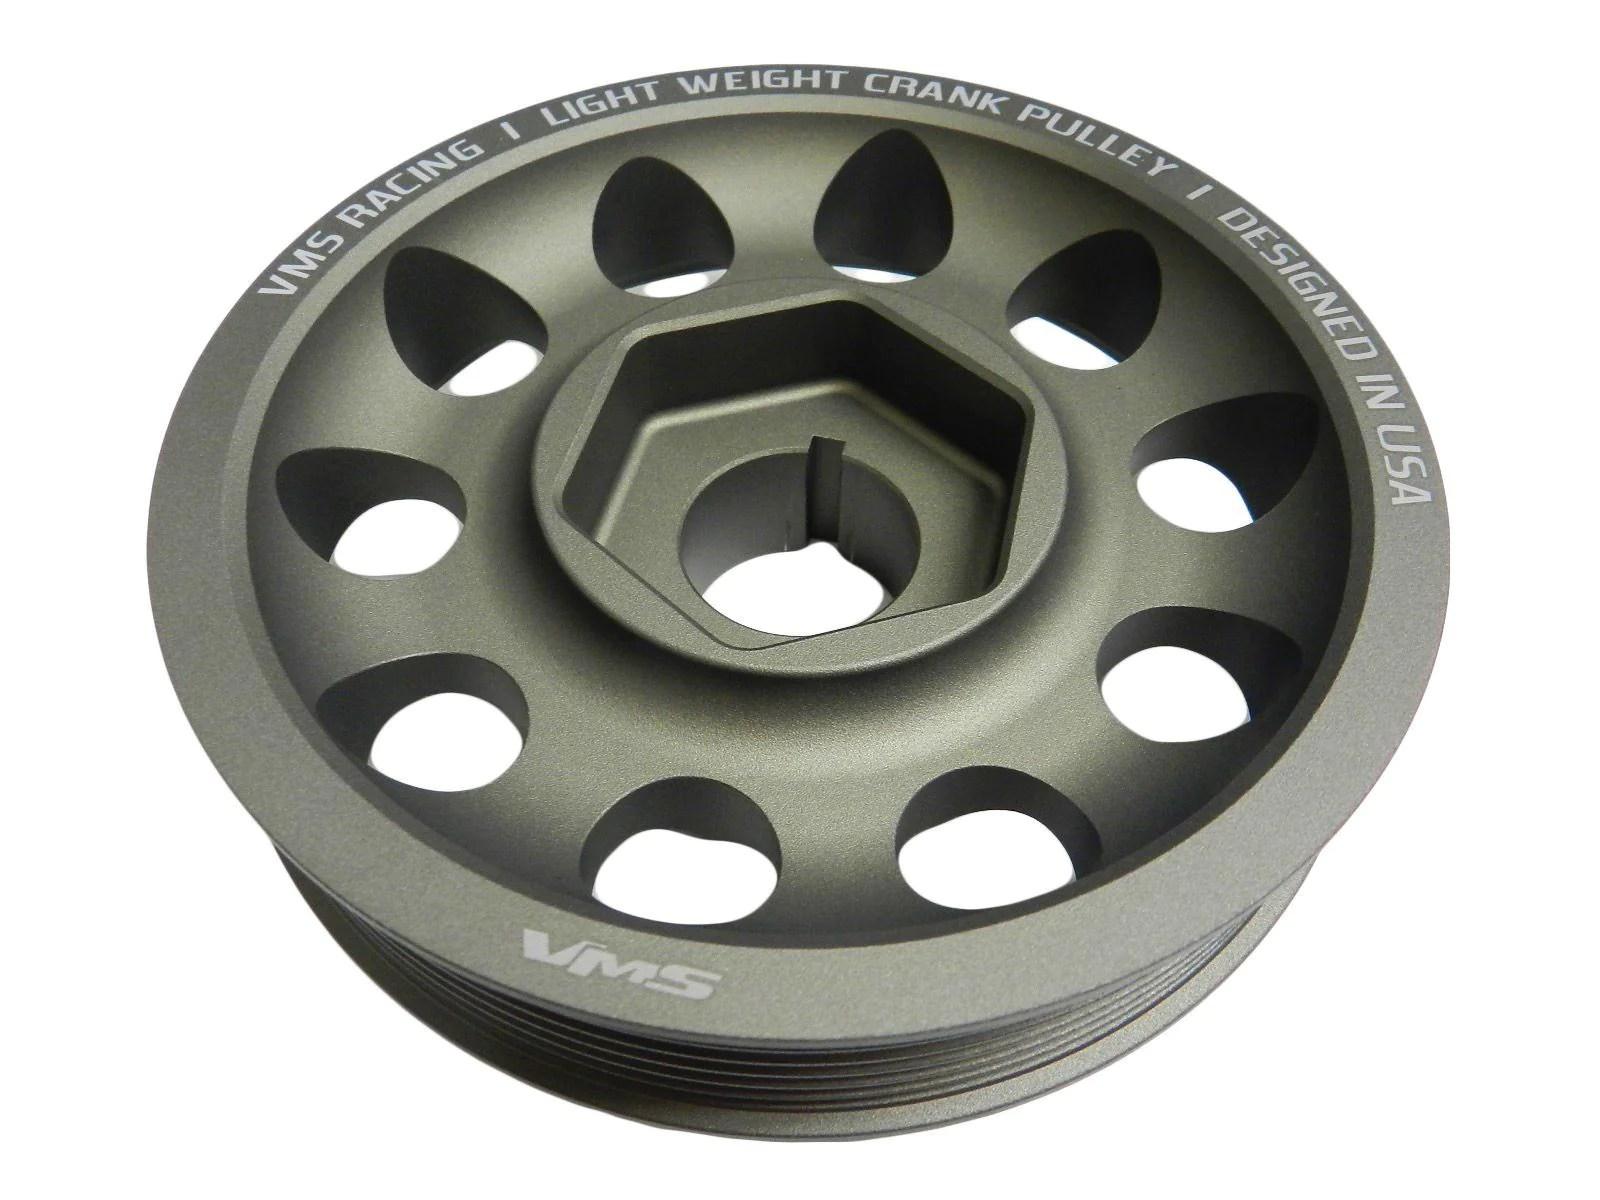 02 04 acura rsx type s light weight oem size aluminum crankshaft crank pulley  [ 1600 x 1200 Pixel ]